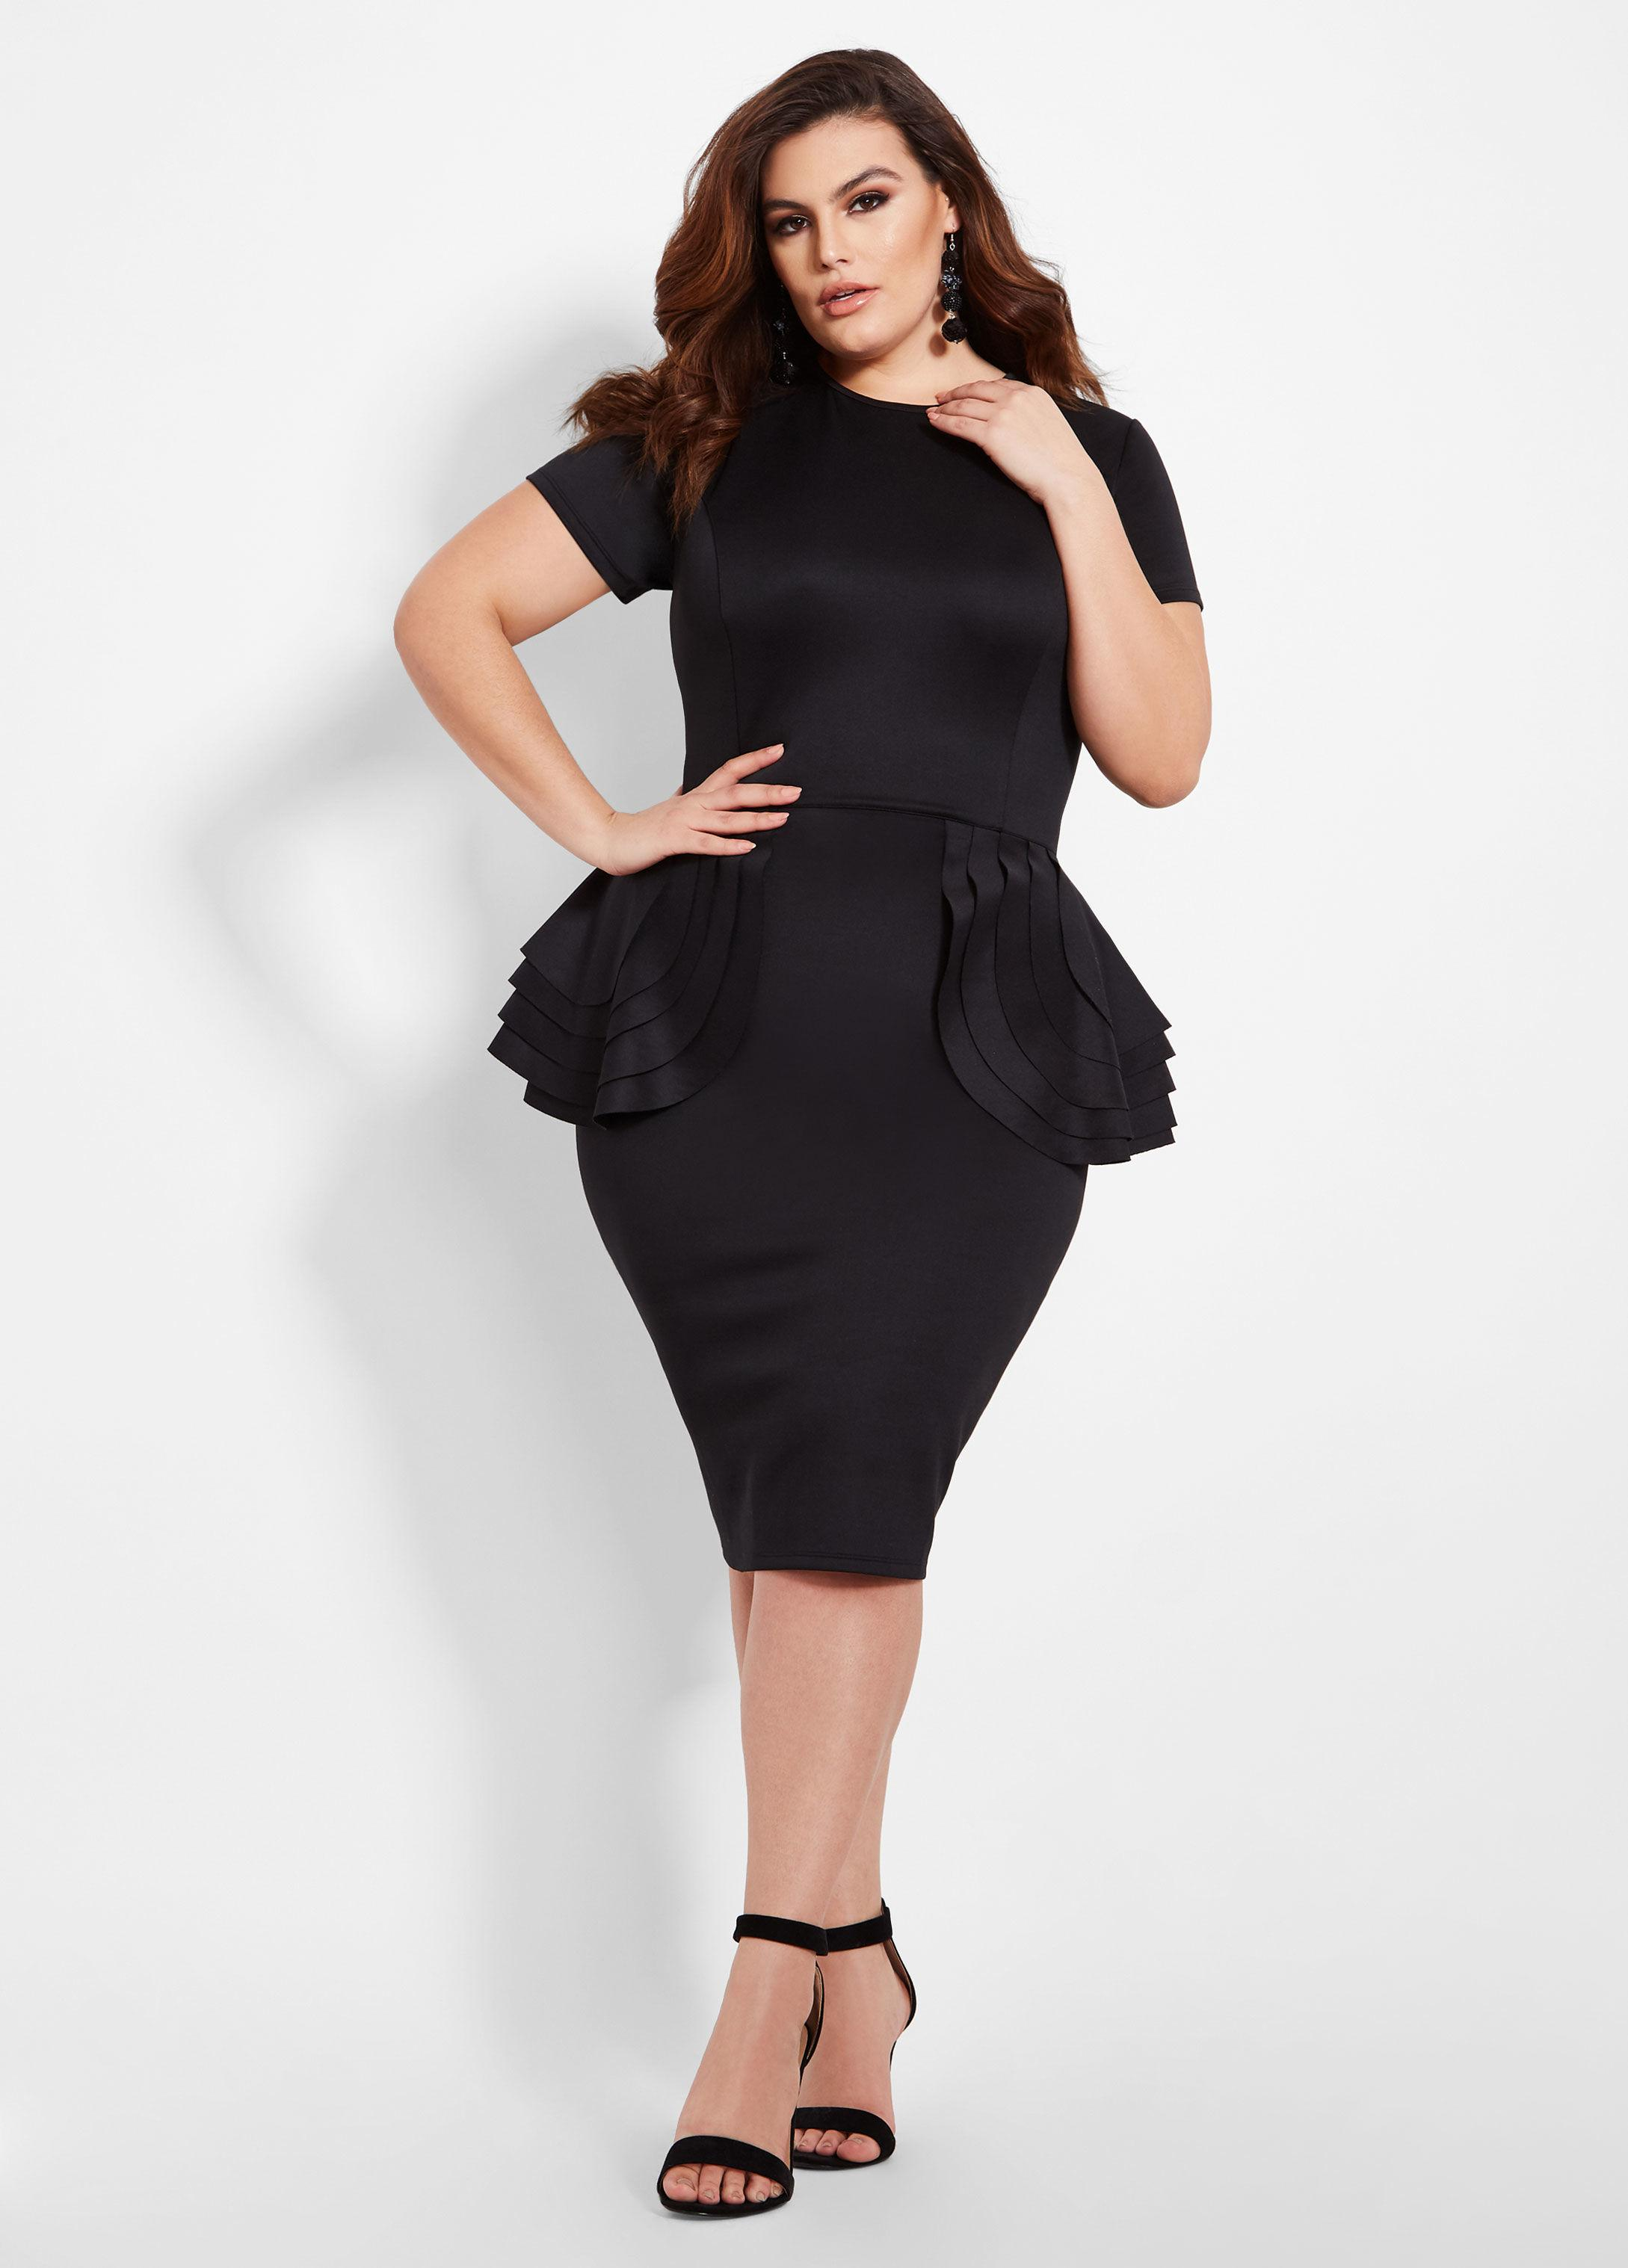 Plus Size Multi Tier Peplum Dress